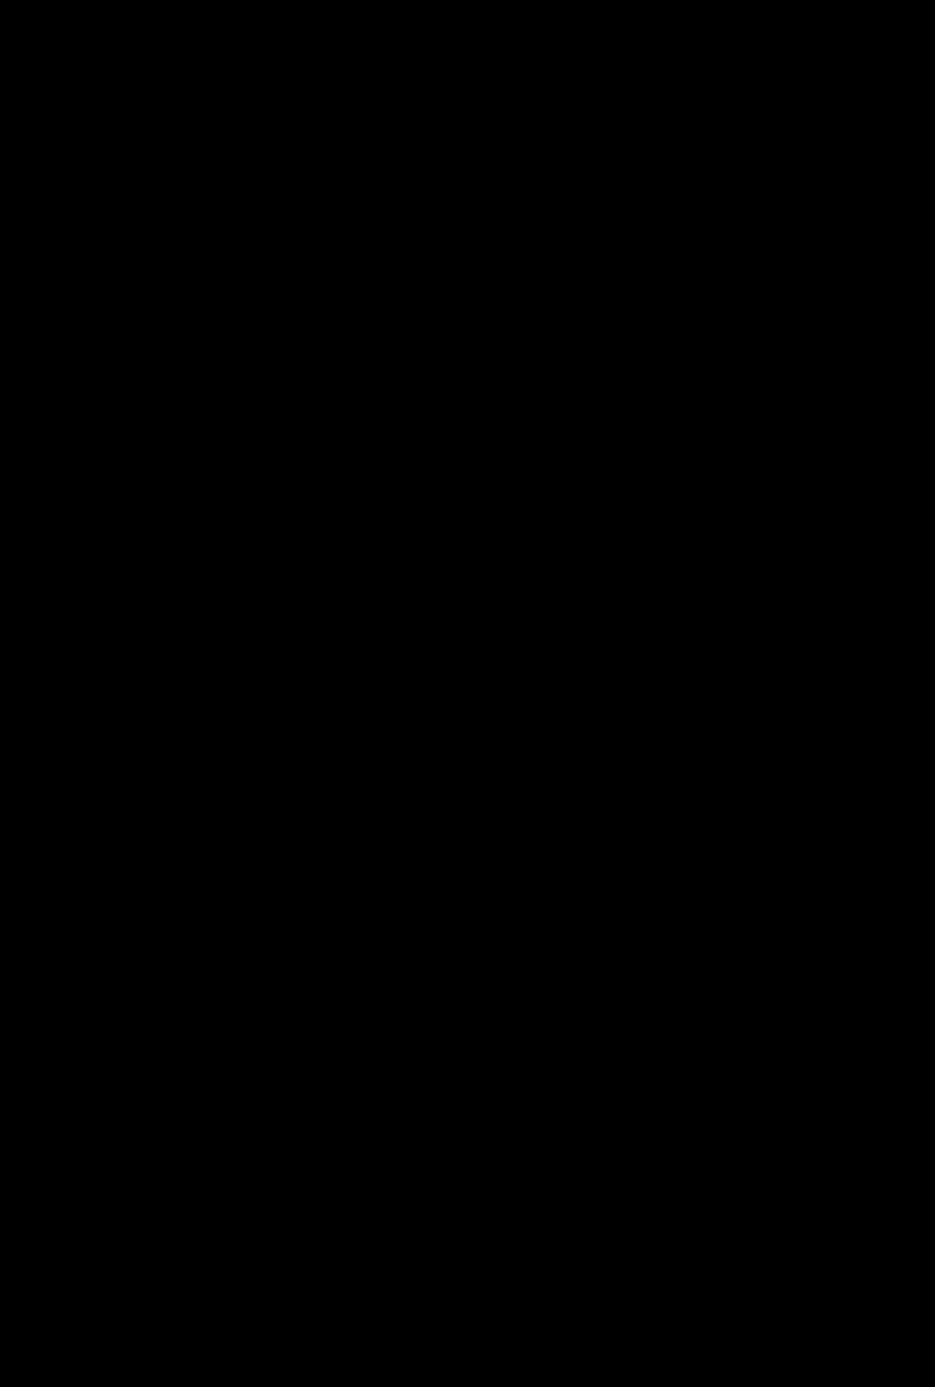 002 (1)